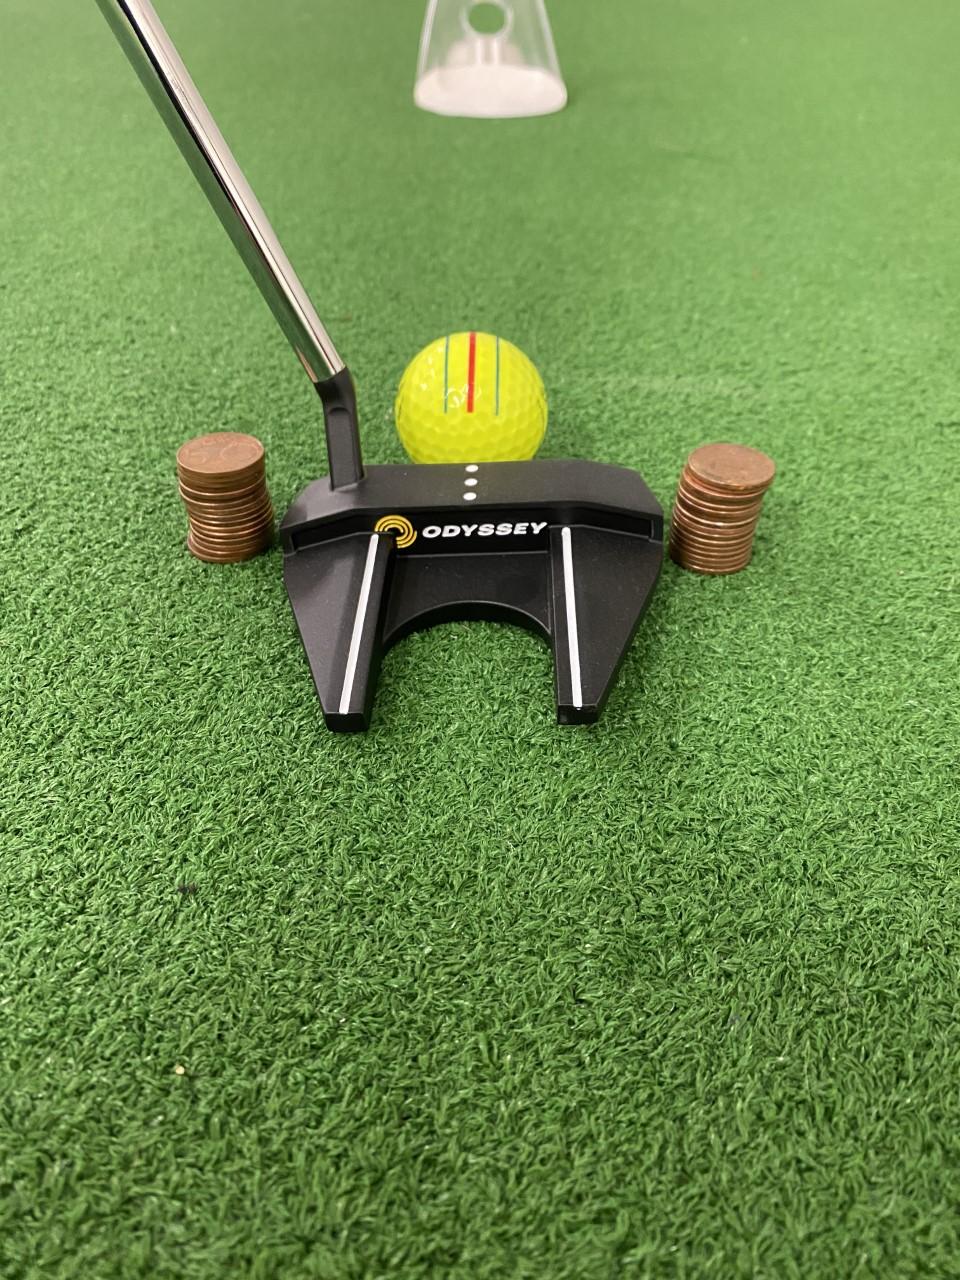 Top Three Indoor Golf Drills During Lockdown